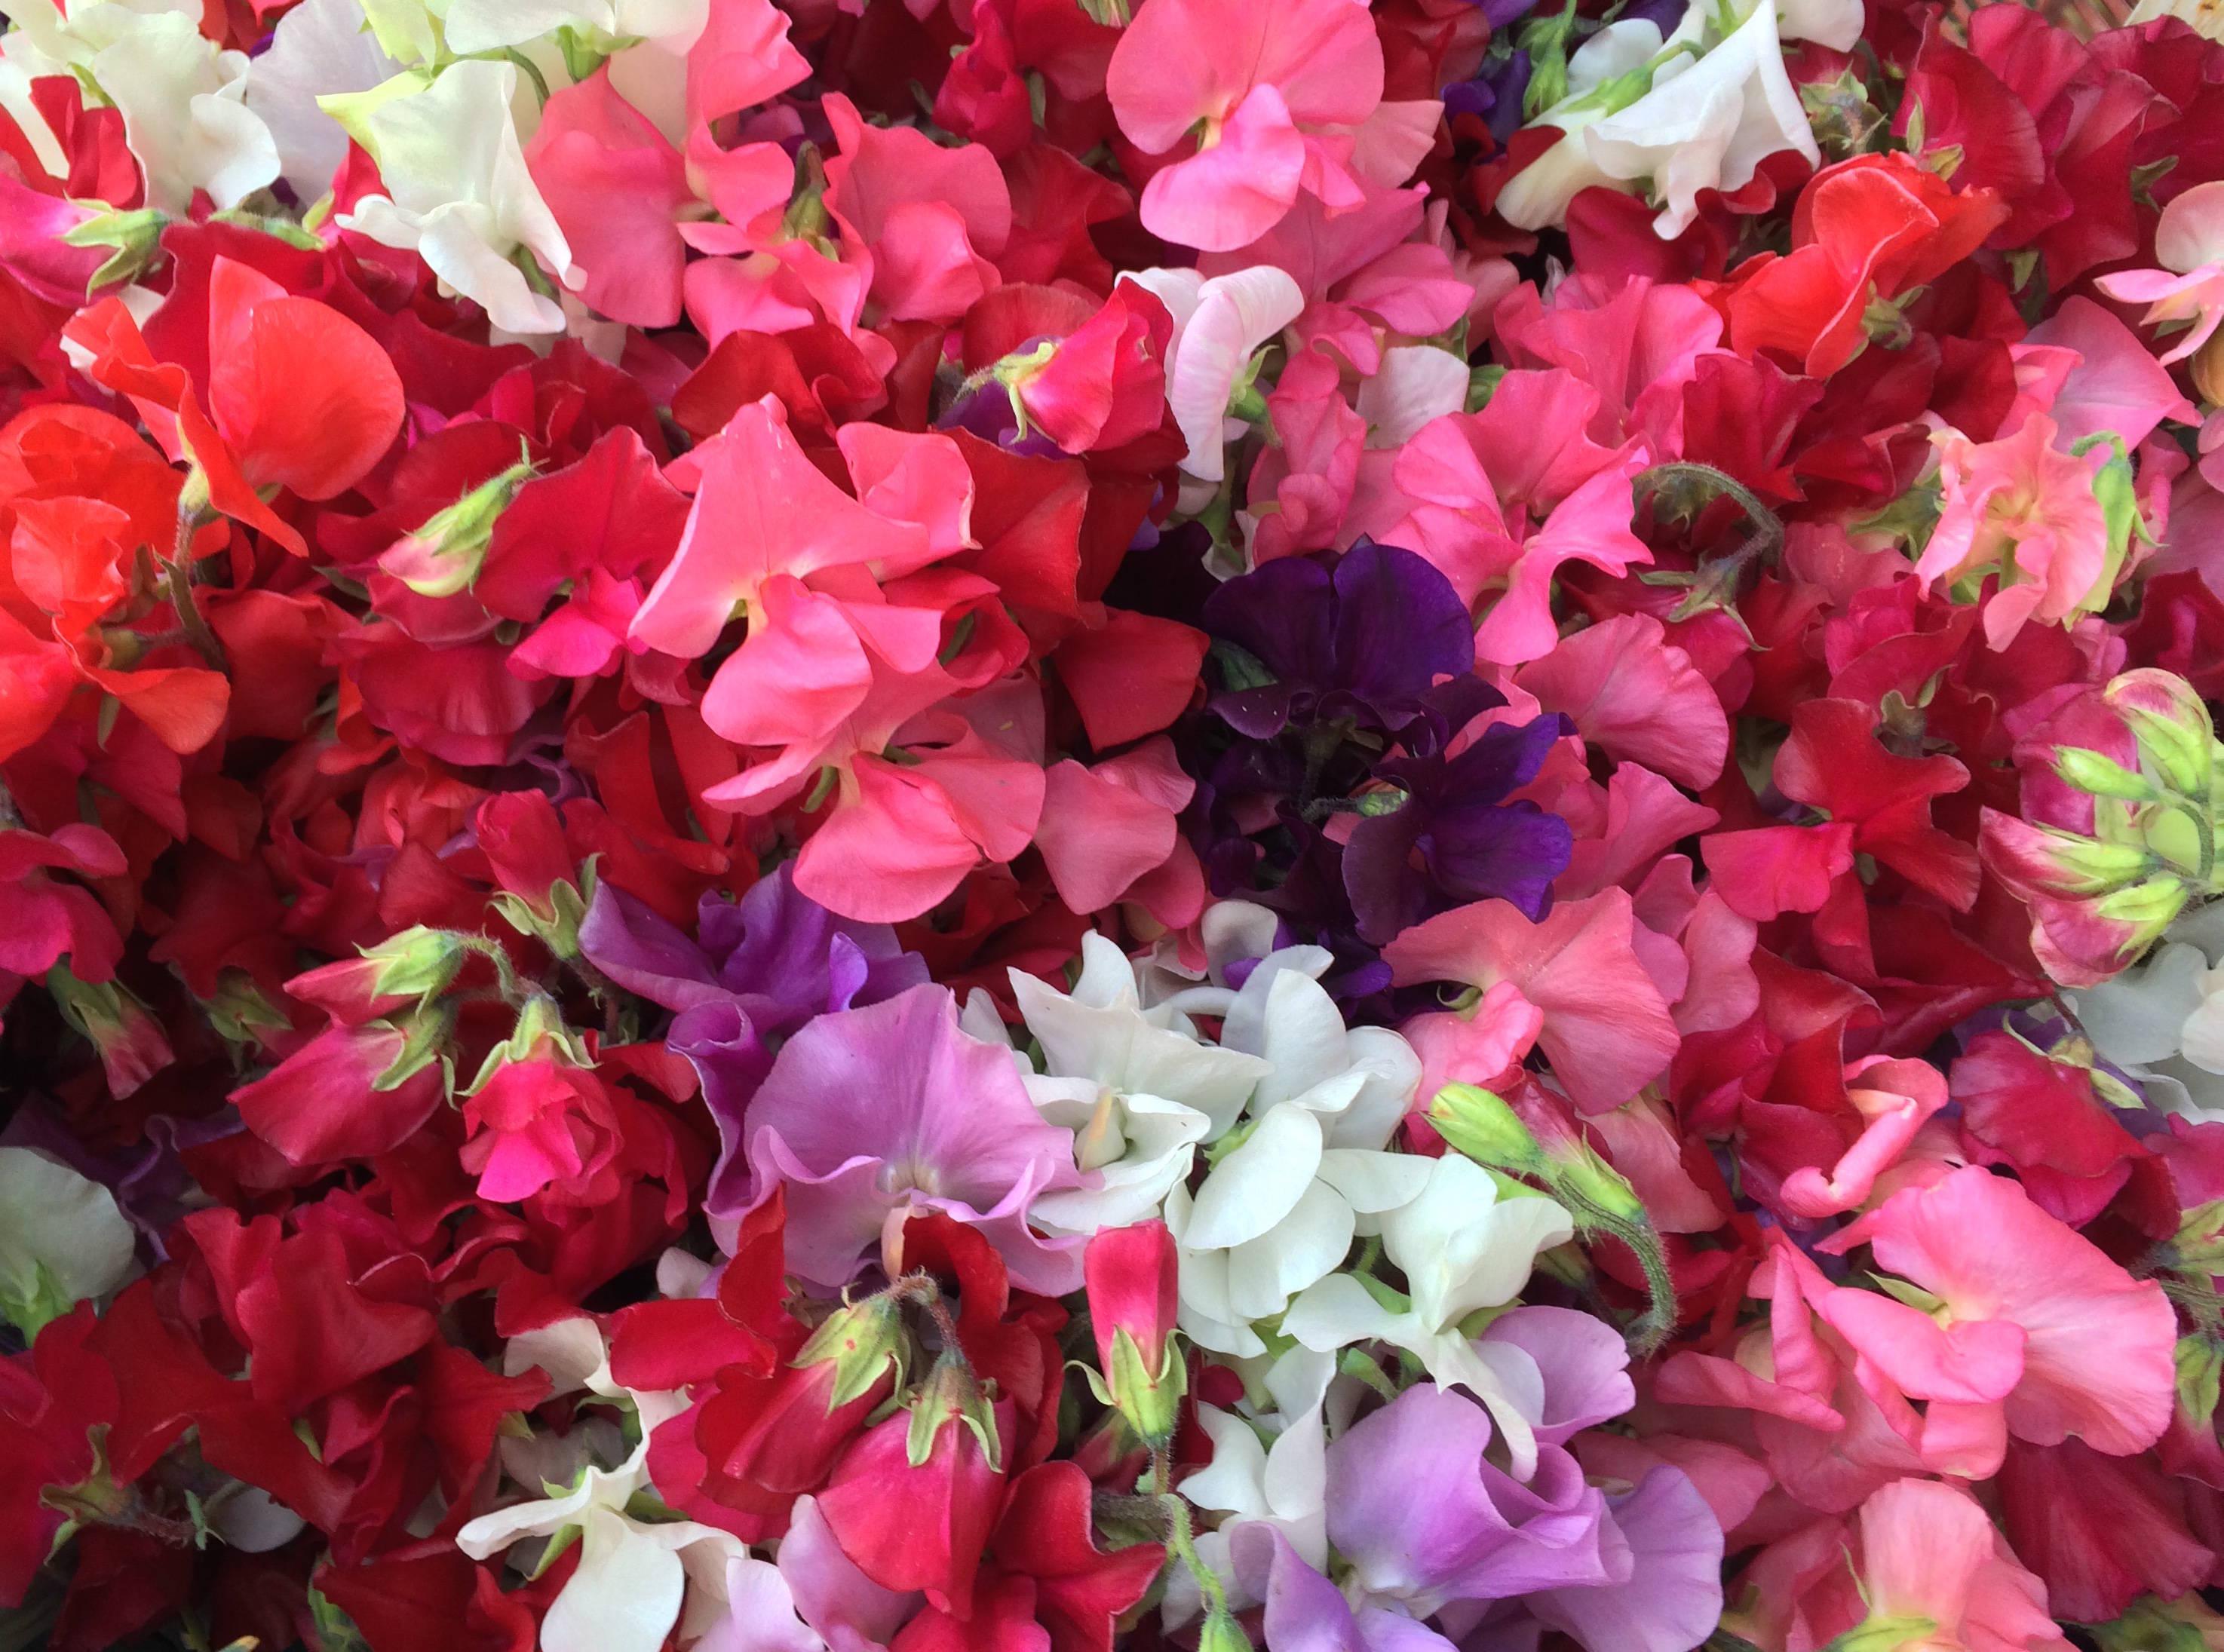 Speechless Sunday: The Beauty of Sweet Pea Flowers